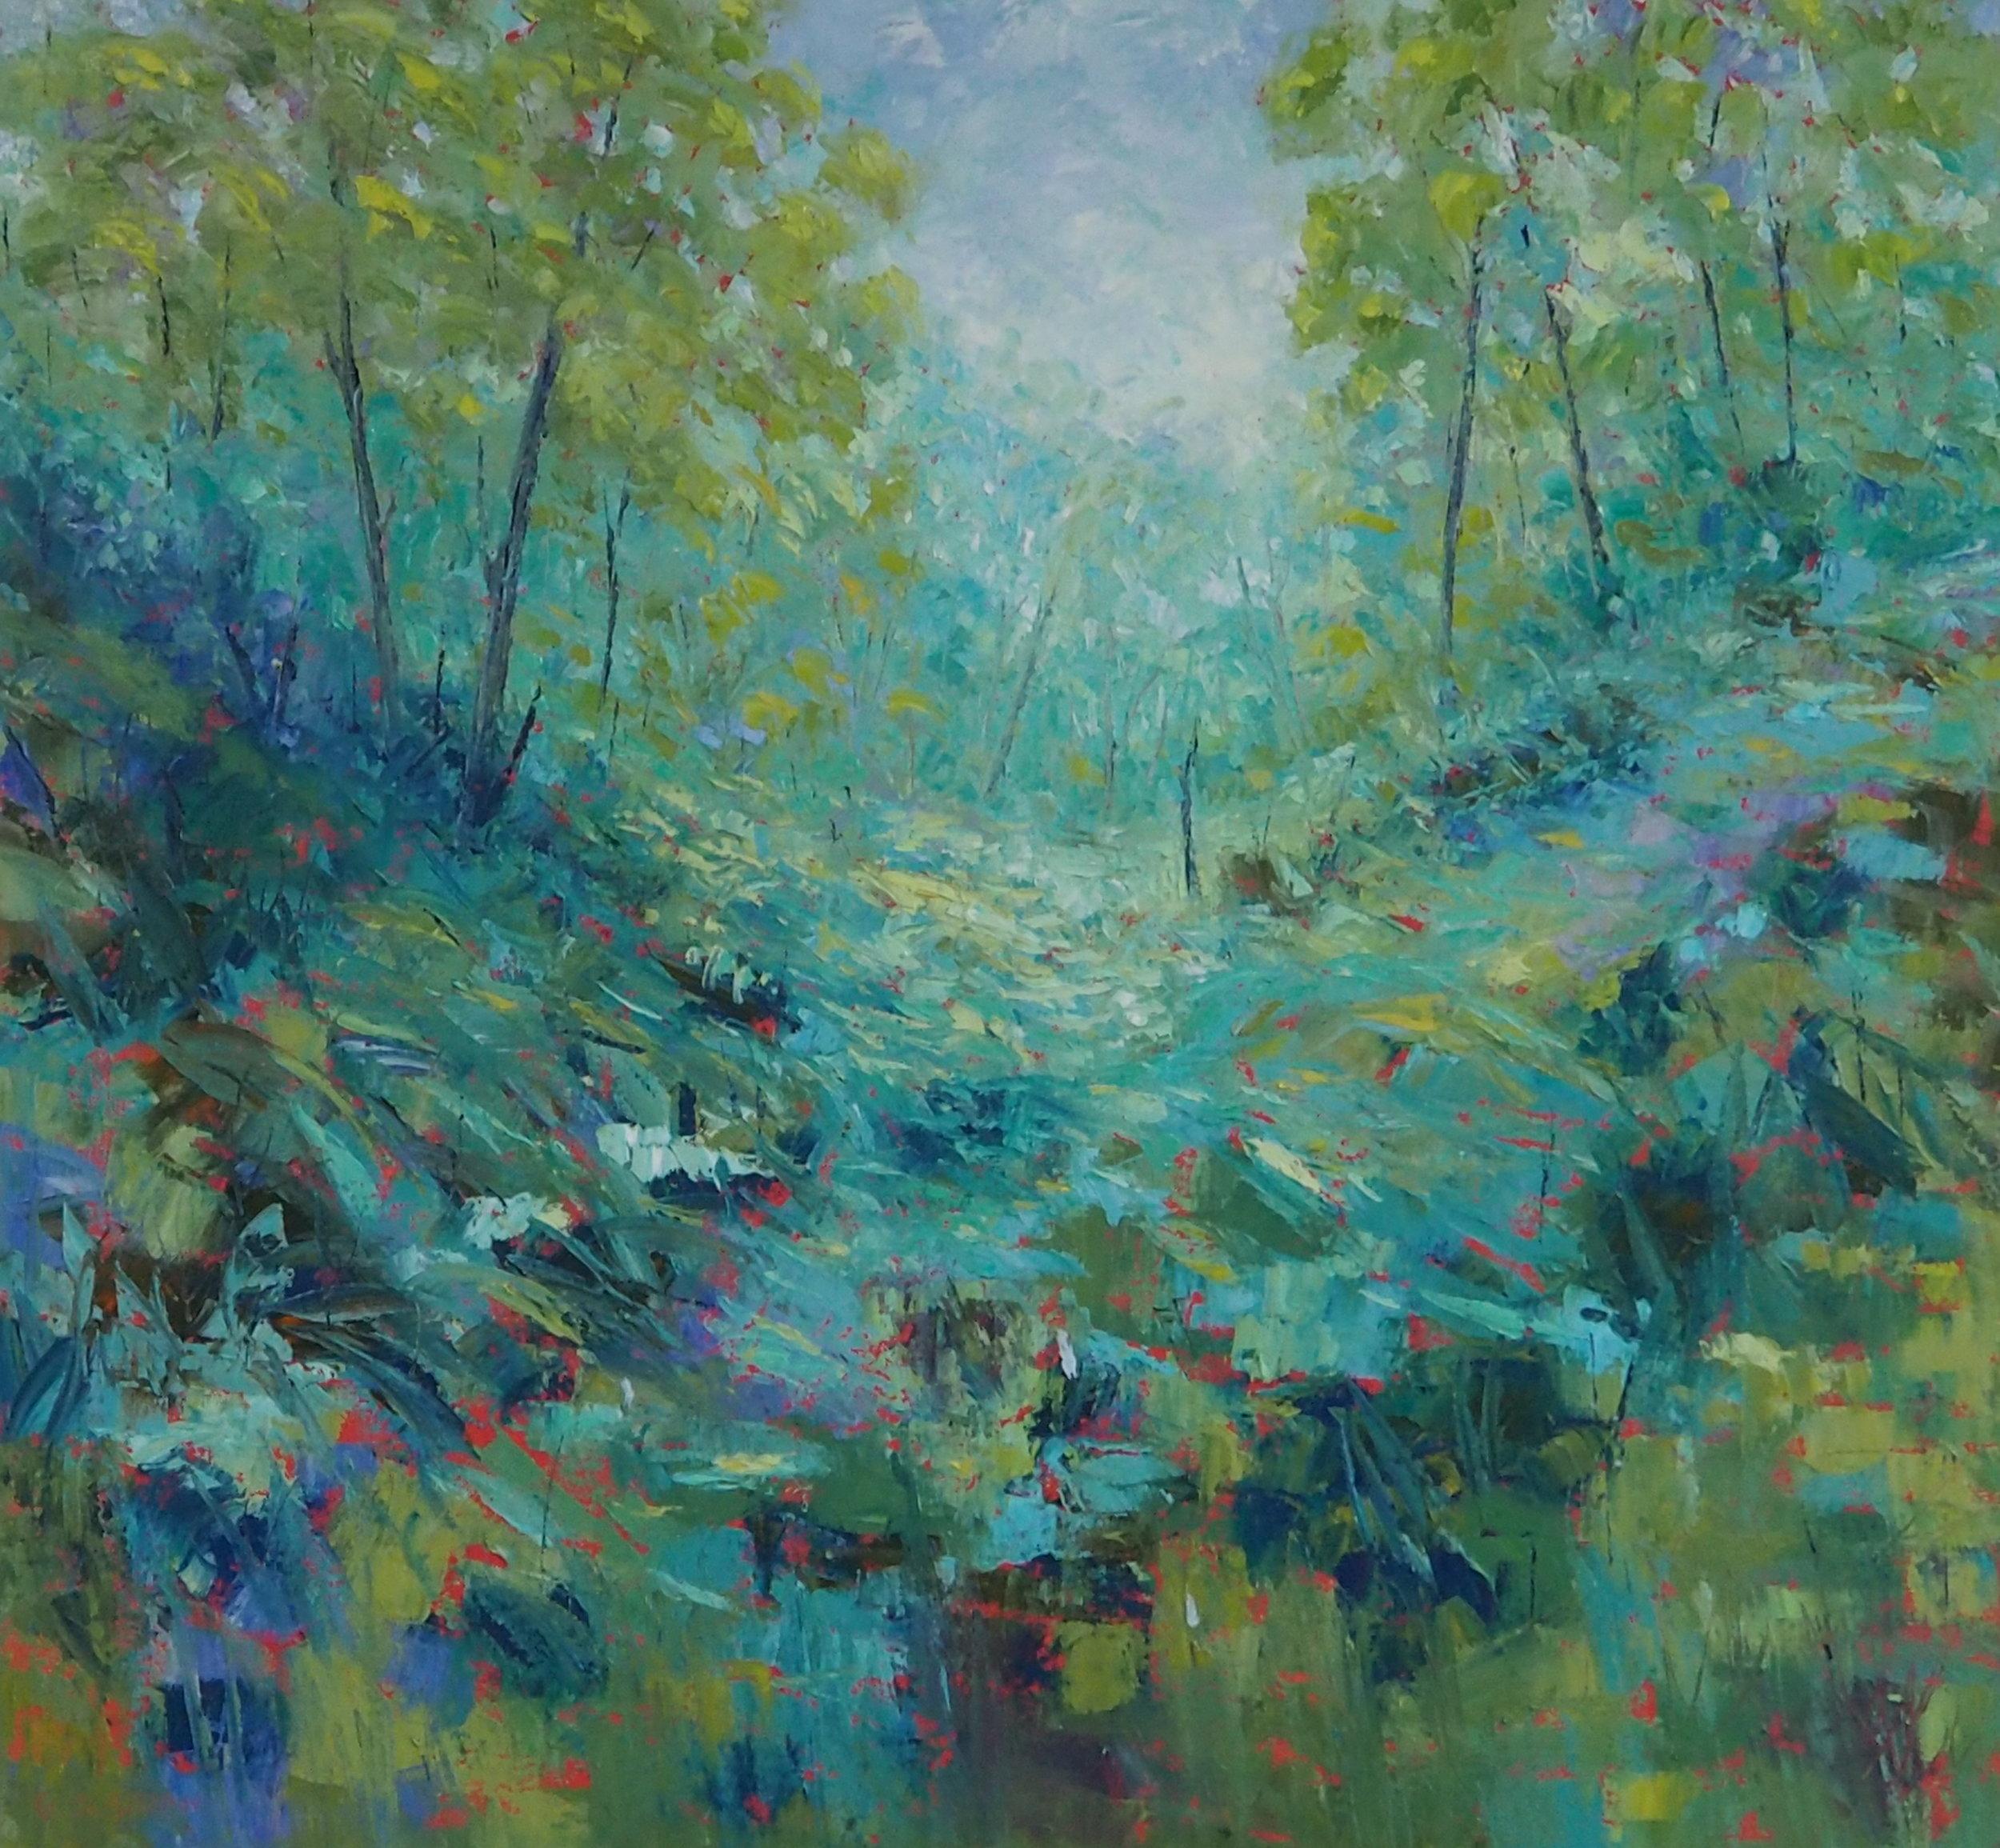 Play-Of-Light.-GAY-SCADDAN-Oil-on-Canvas.-76cmx76m.jpg